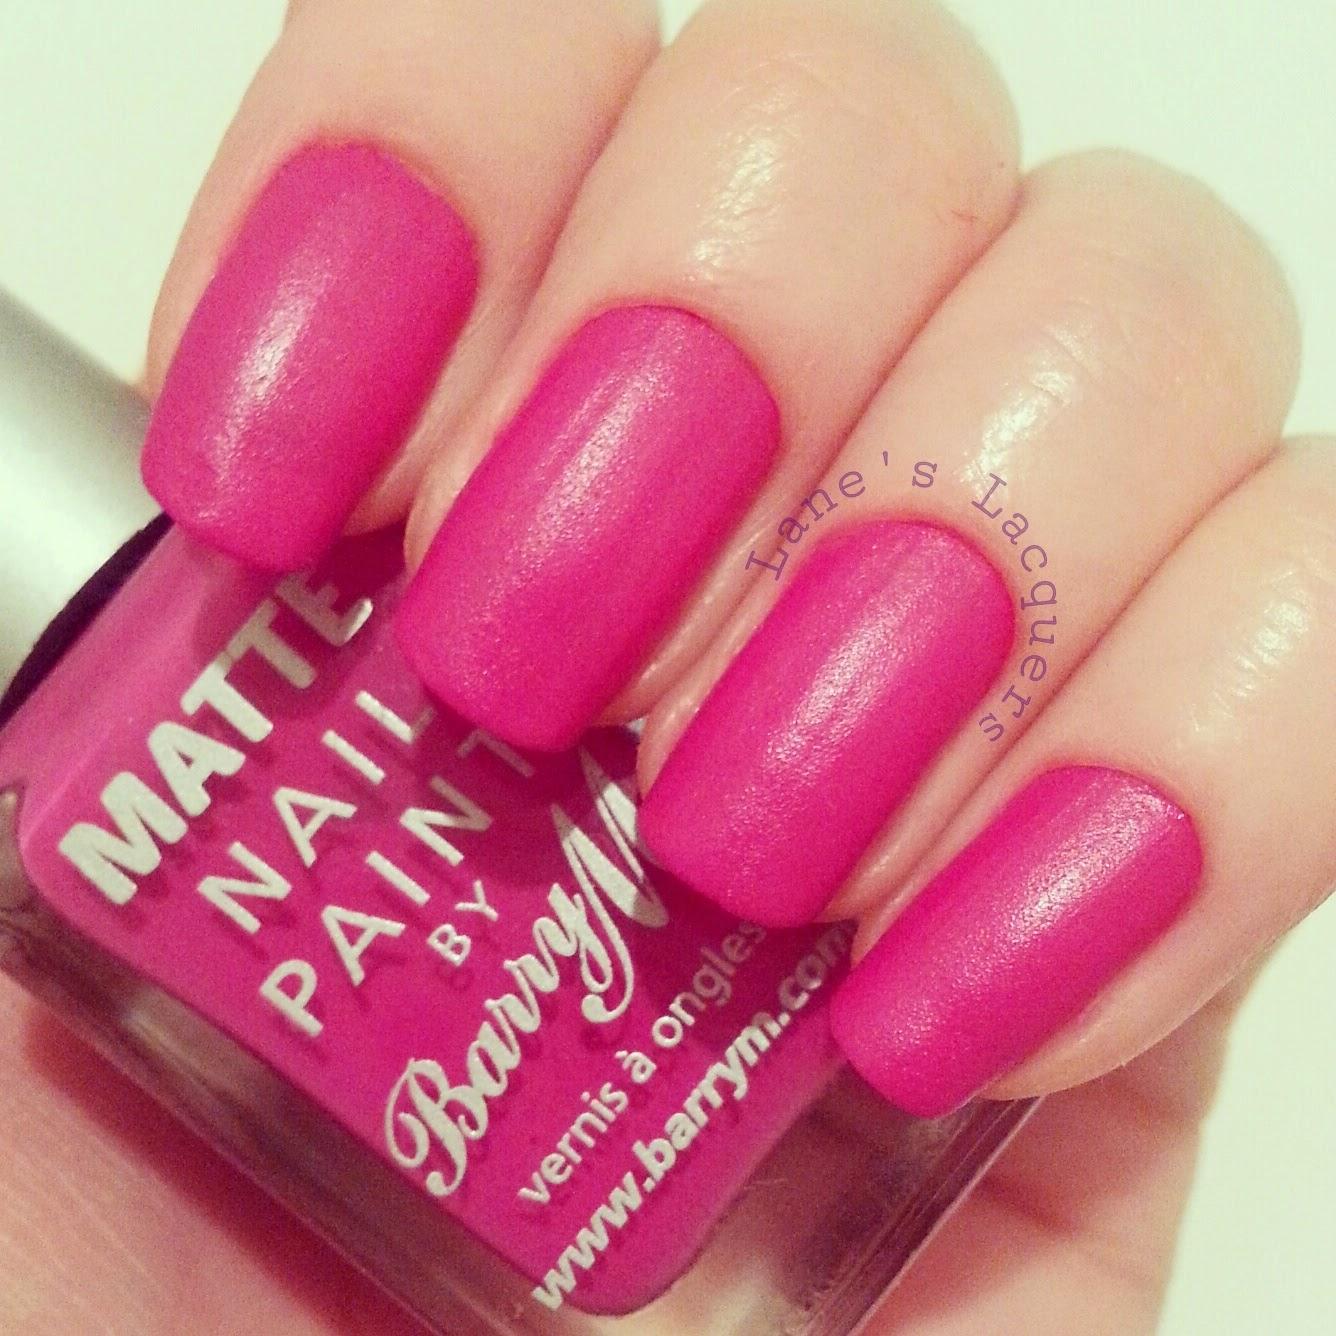 barry-m-rhossili-swatch-manicure (2)